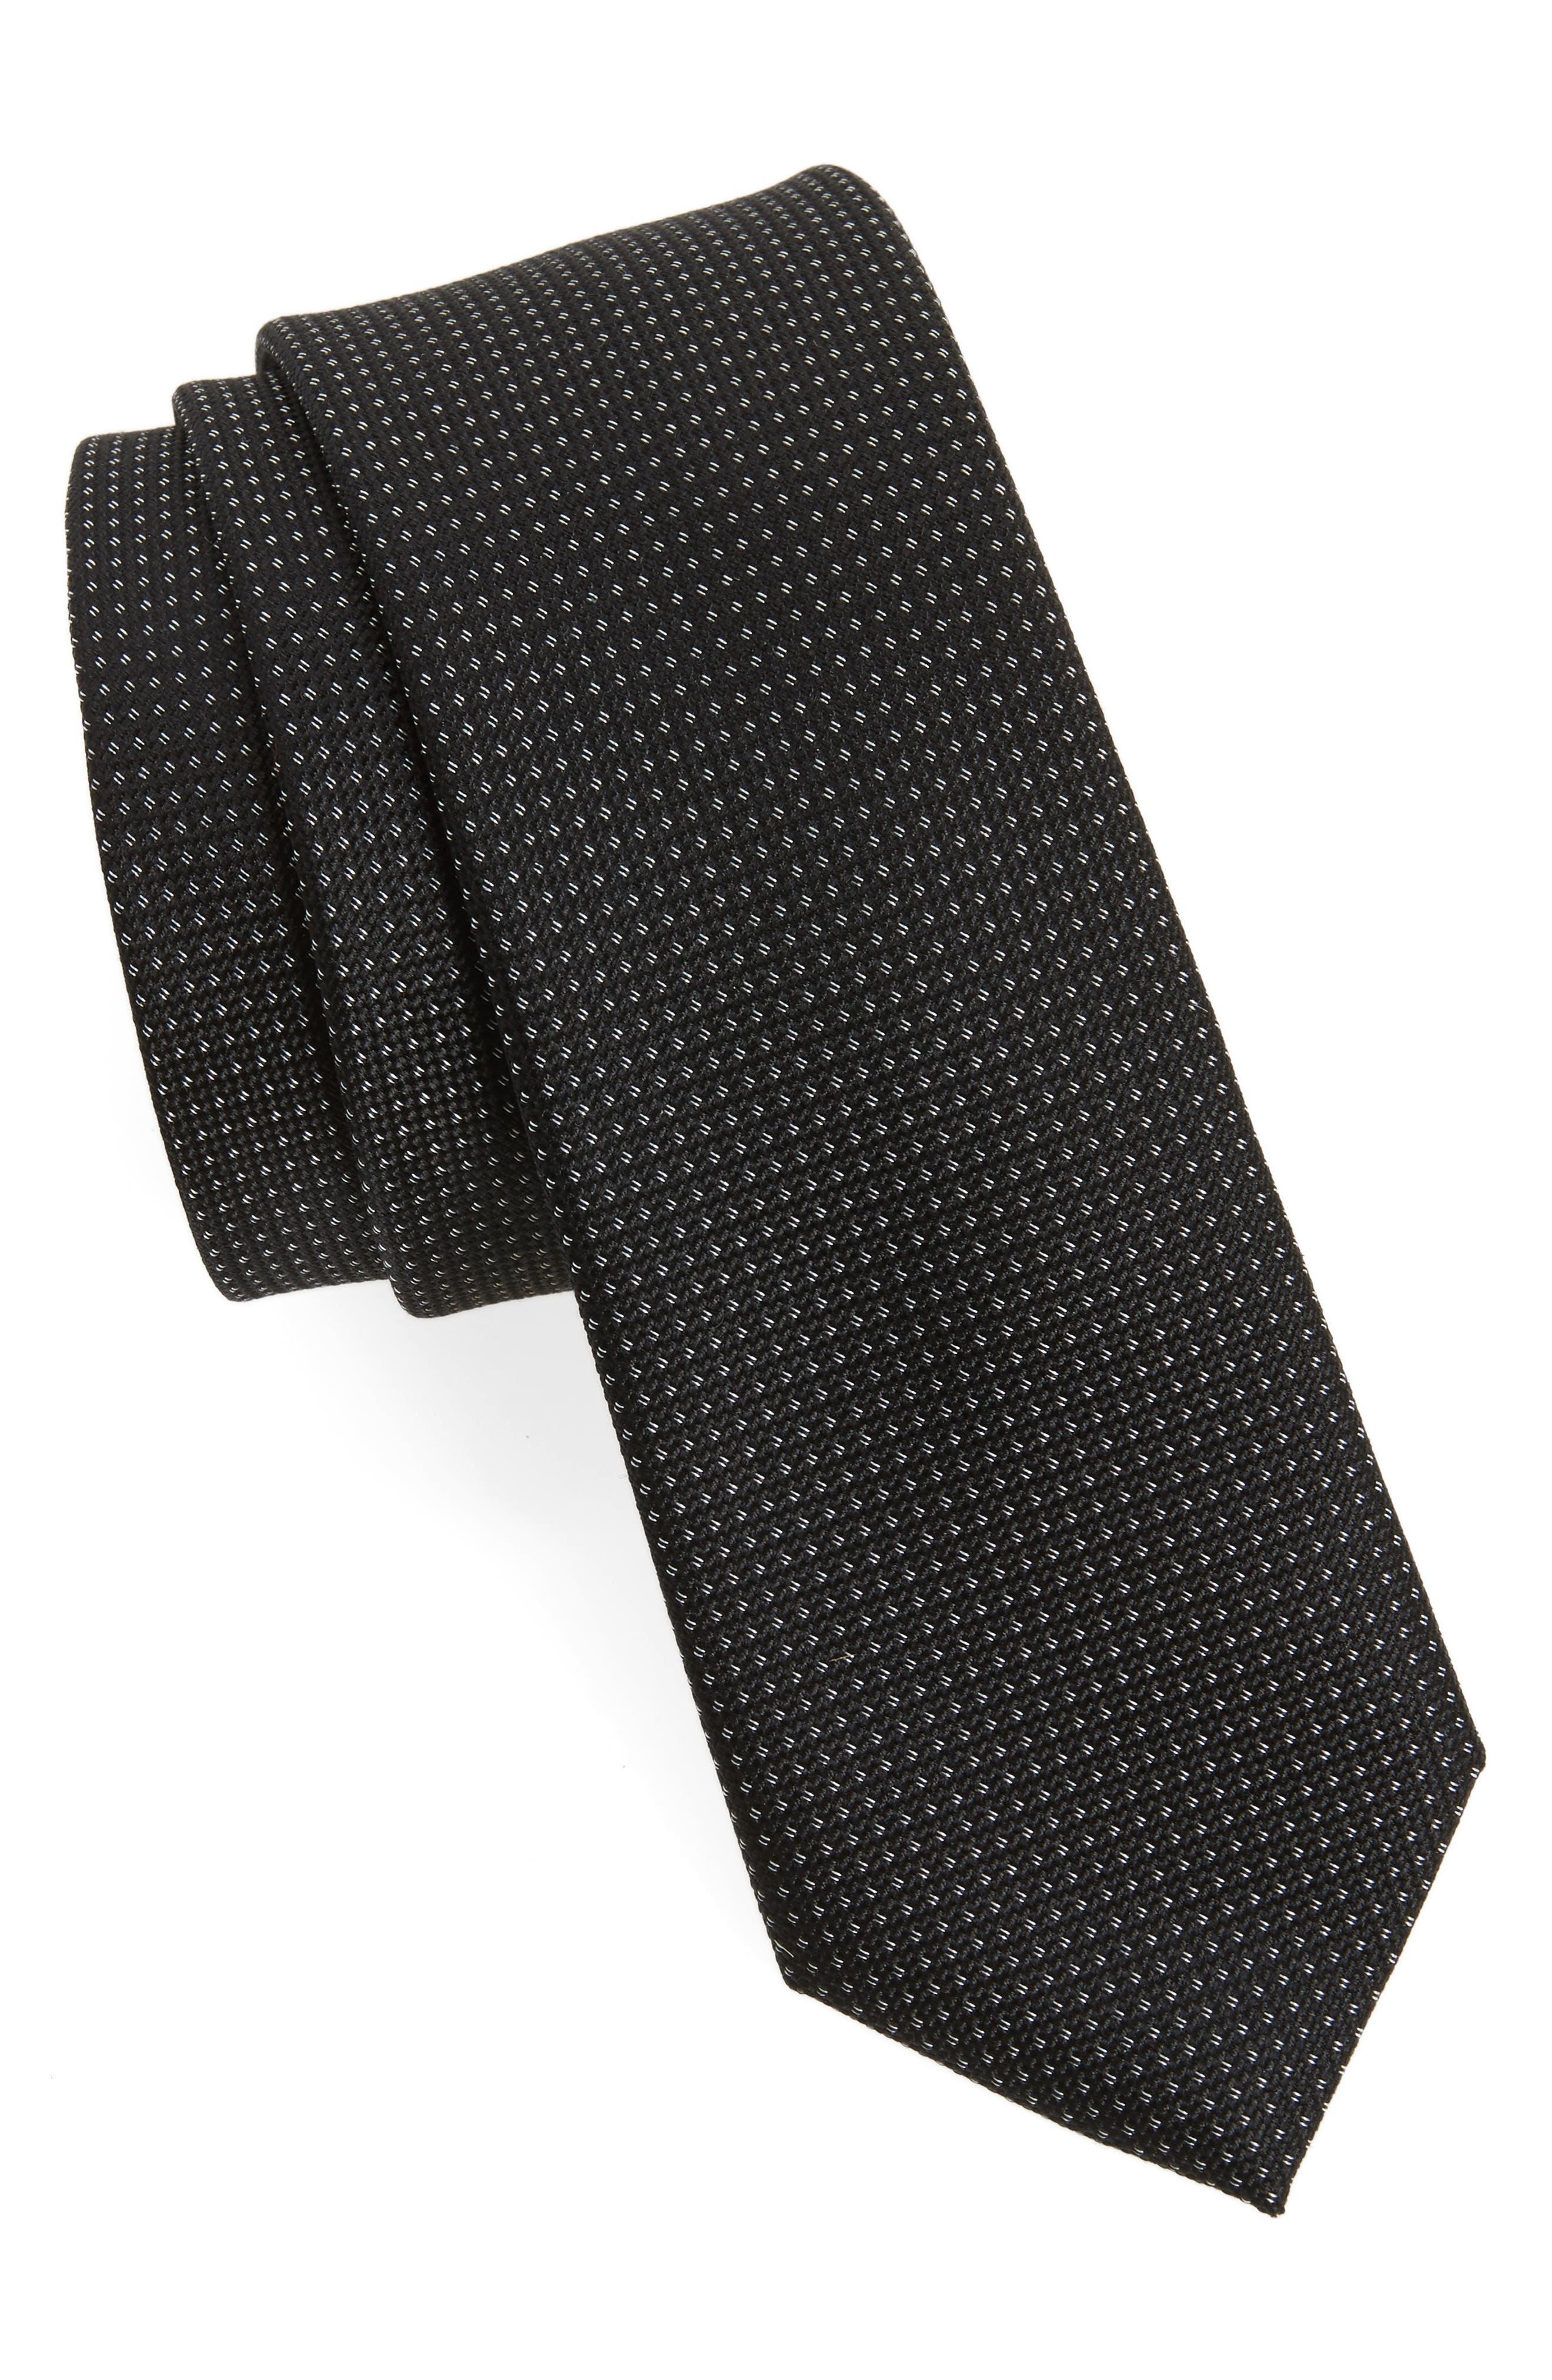 Alternate Image 1 Selected - Calibrate Black & White Silk Tie